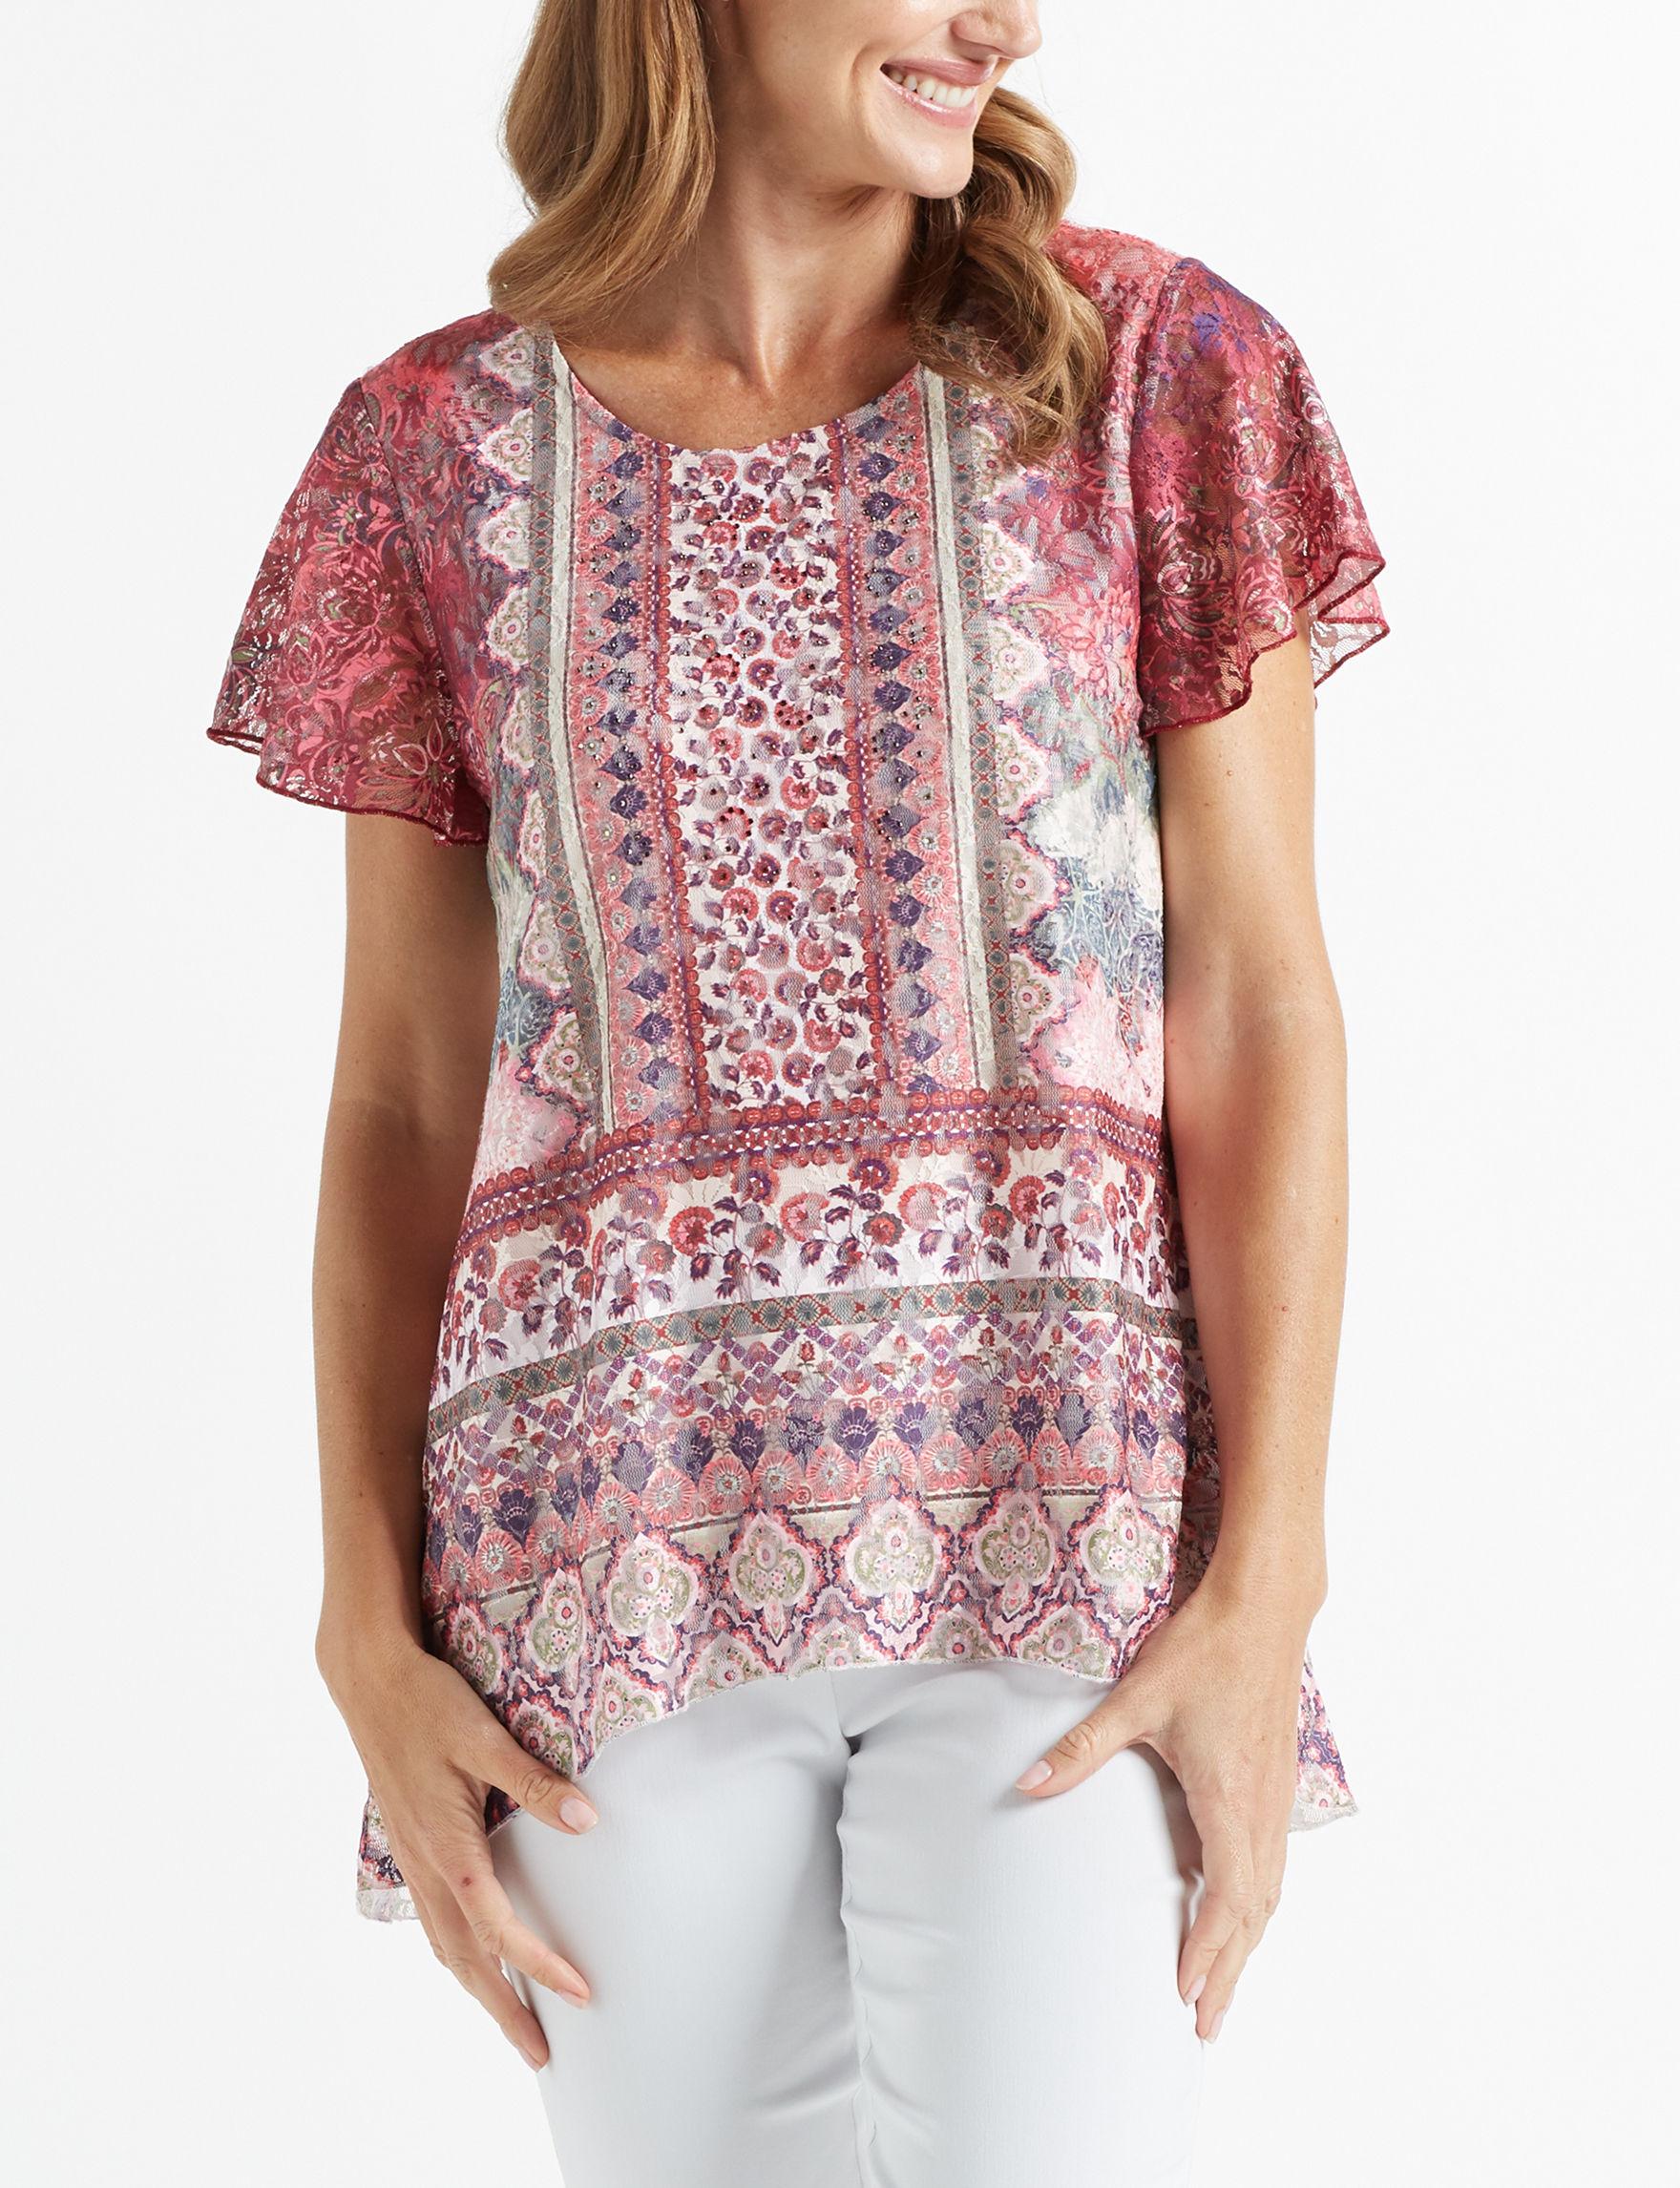 89th & Madison Sunset Shirts & Blouses